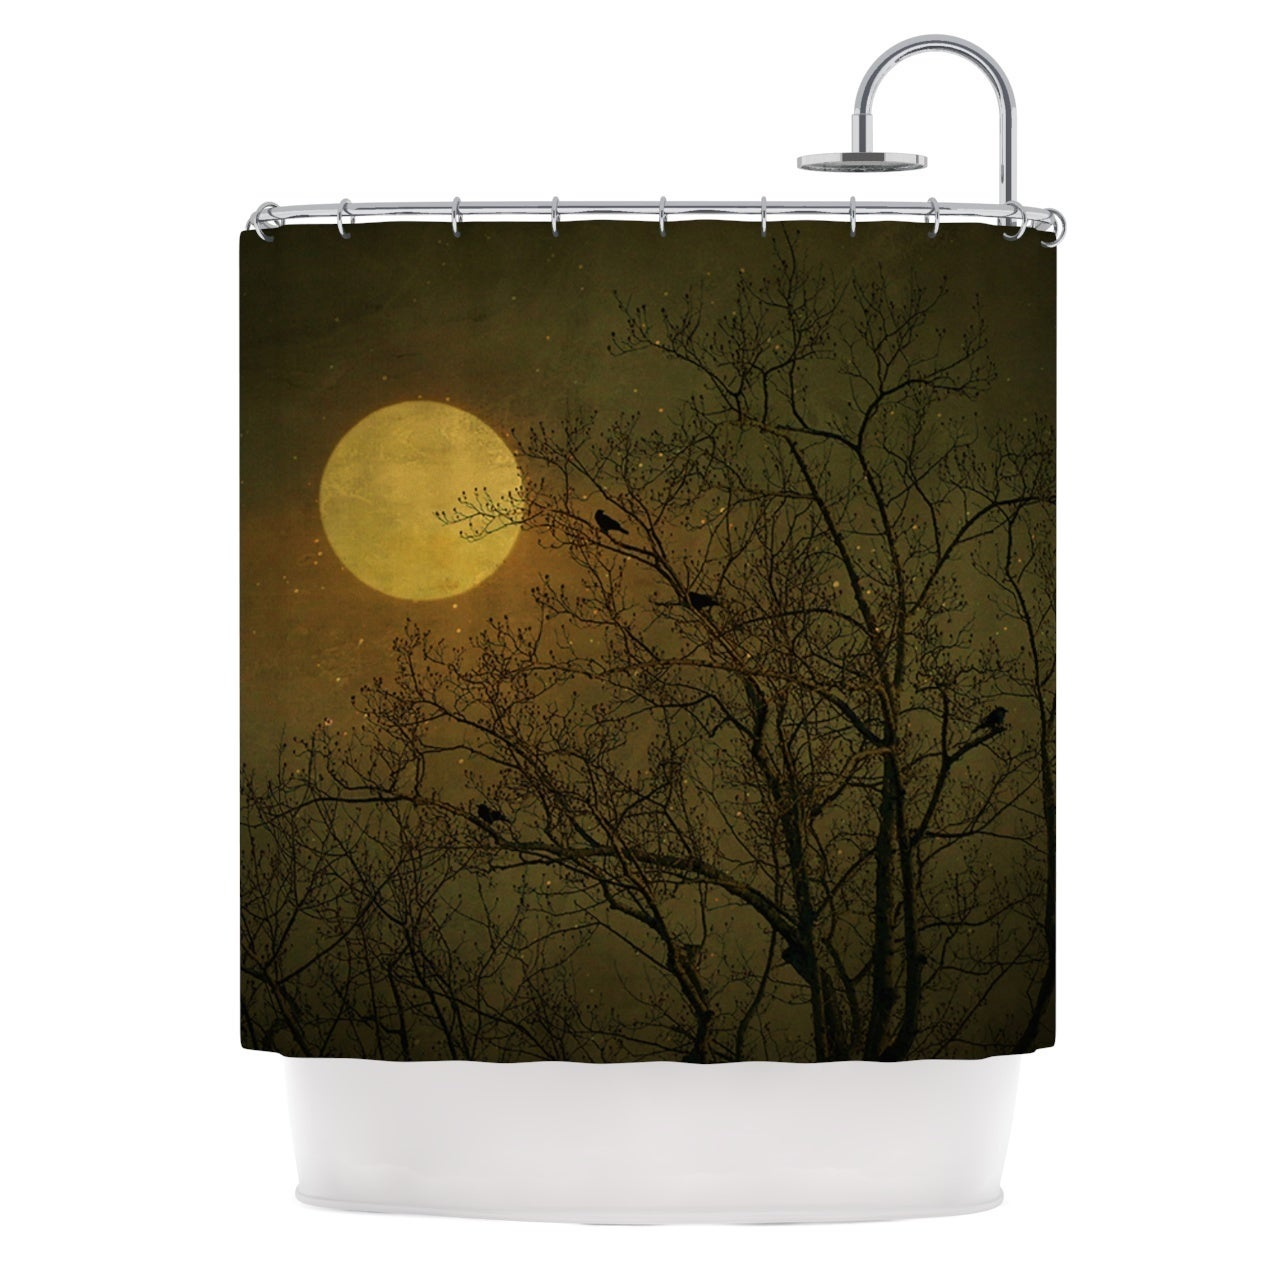 Shop Kess InHouse Robin Dickinson Starry Night Shower Curtain